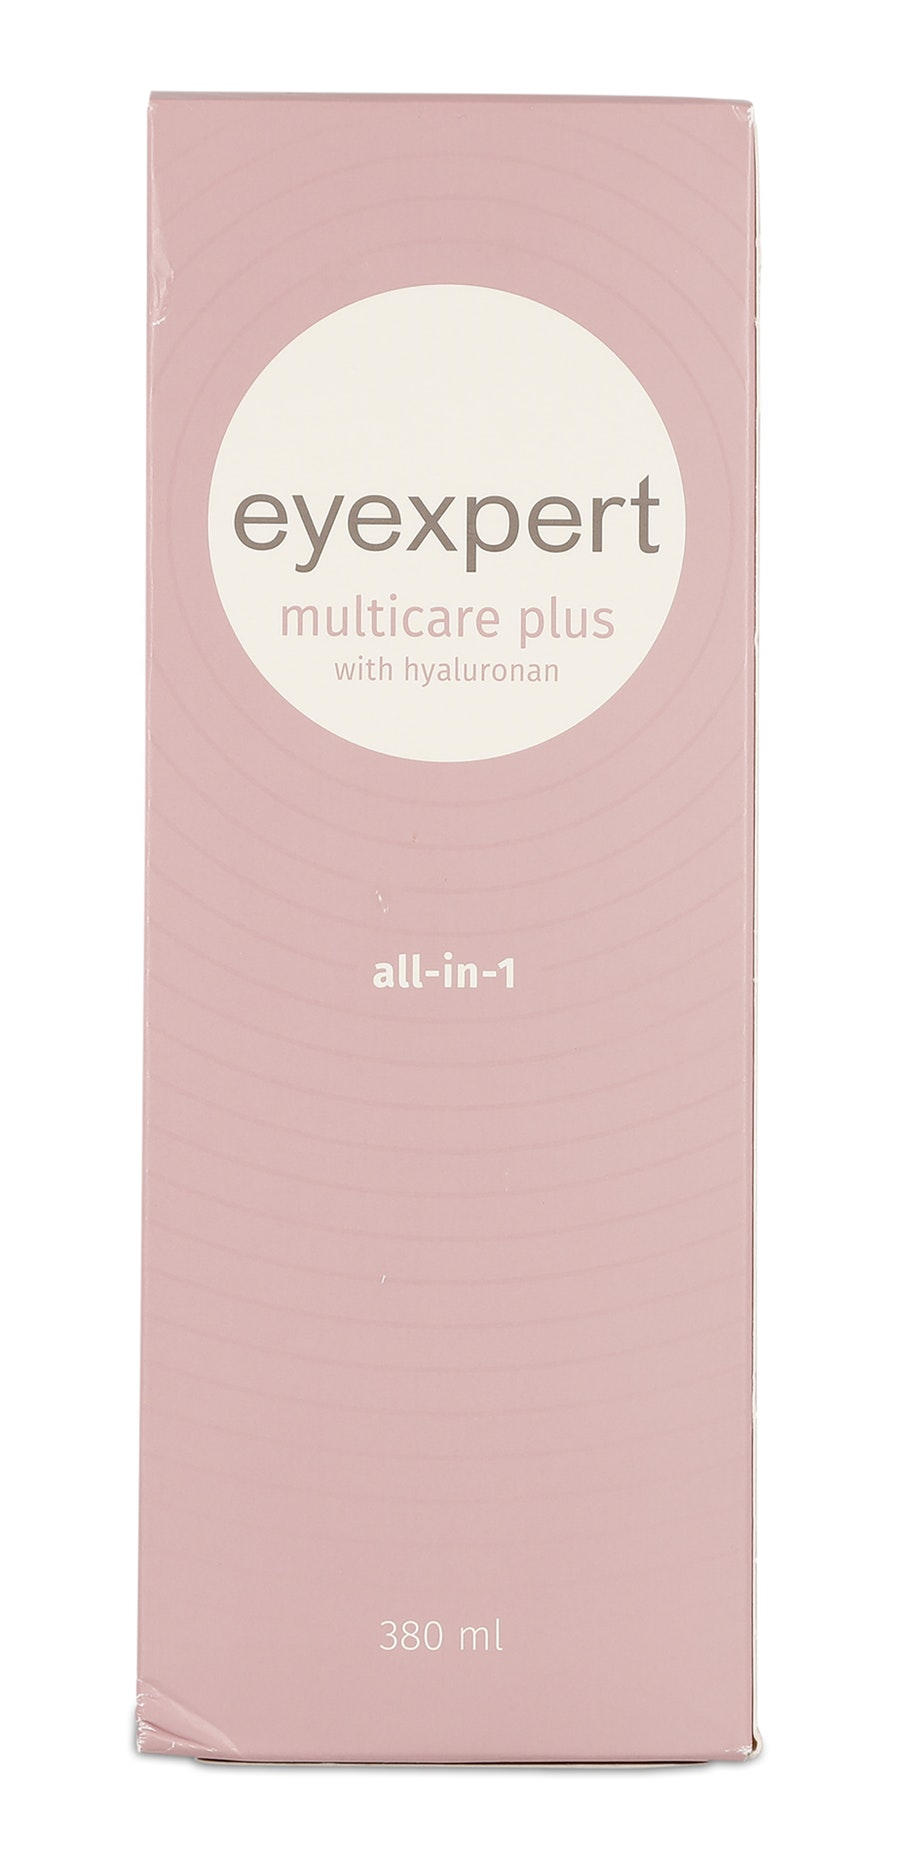 Eyexpert All-in-1 Multicare Plus 380ml